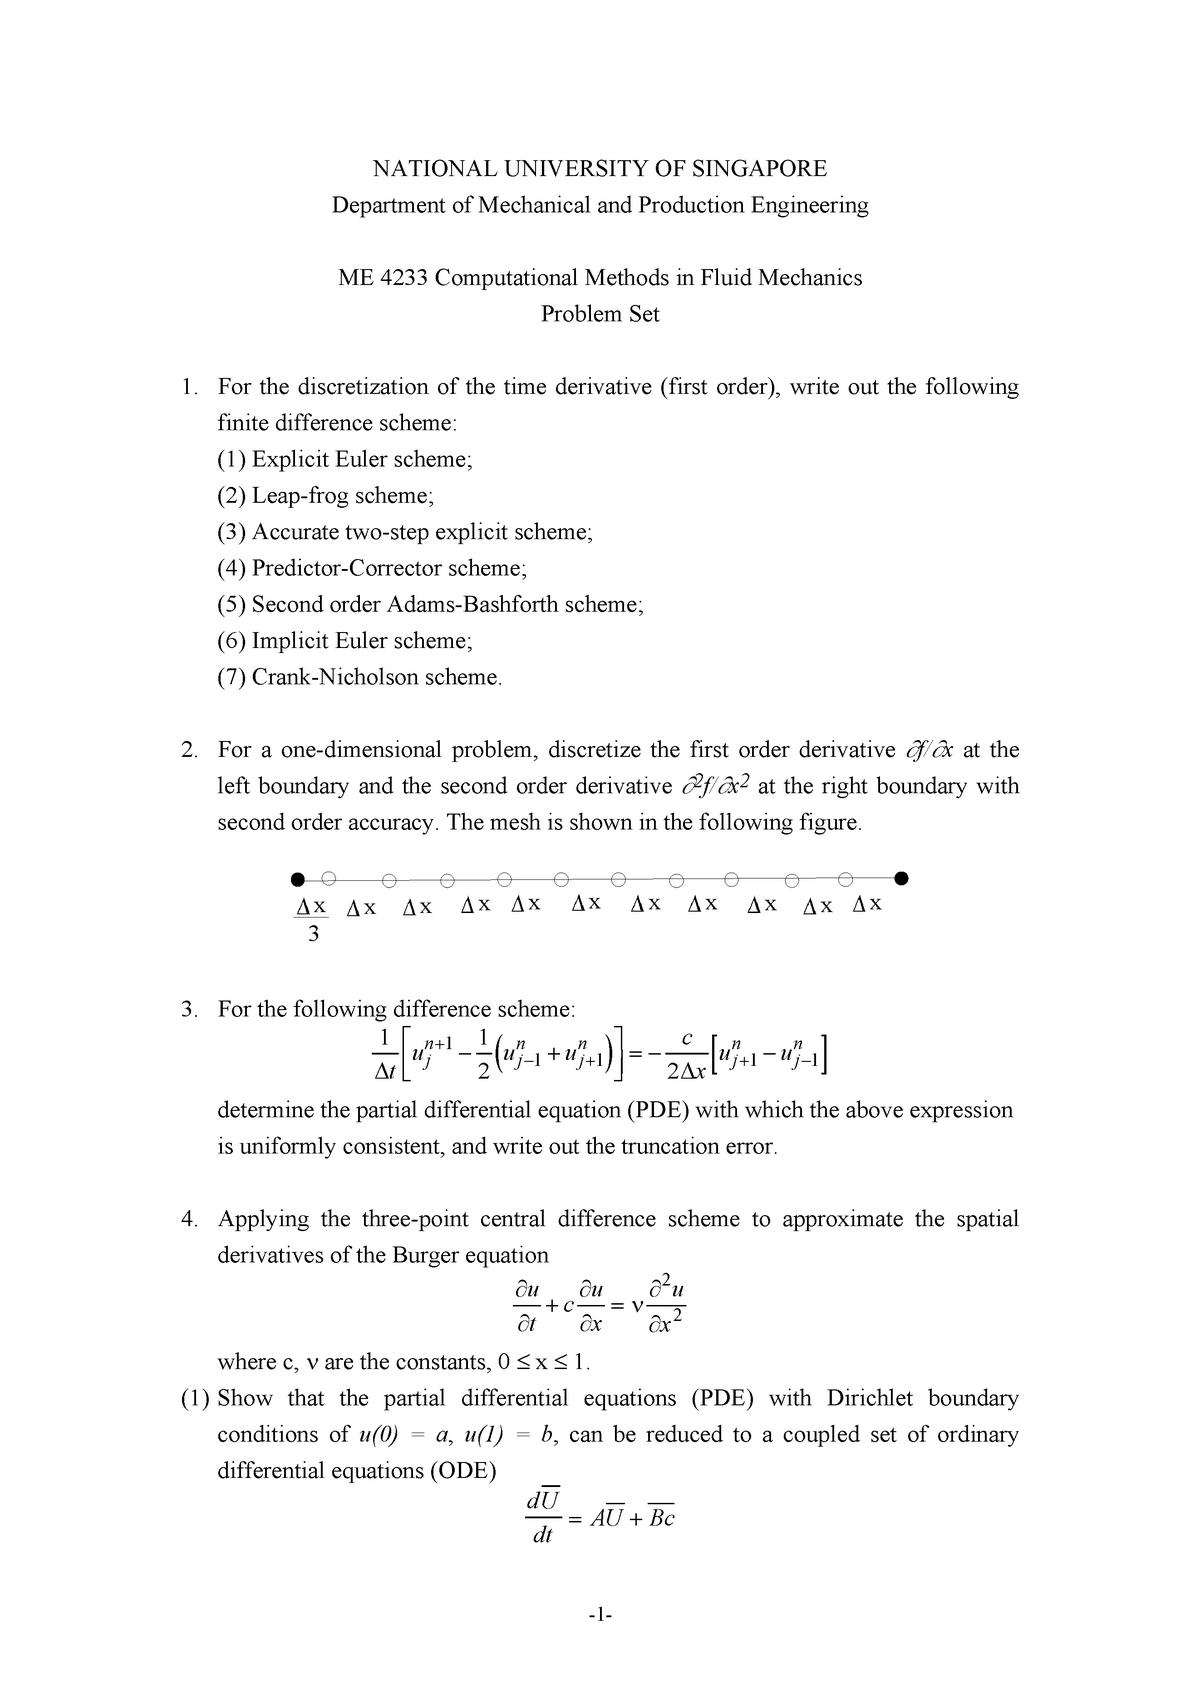 Exam 2017 - ME4233: Computational Methods In Fluid - StuDocu